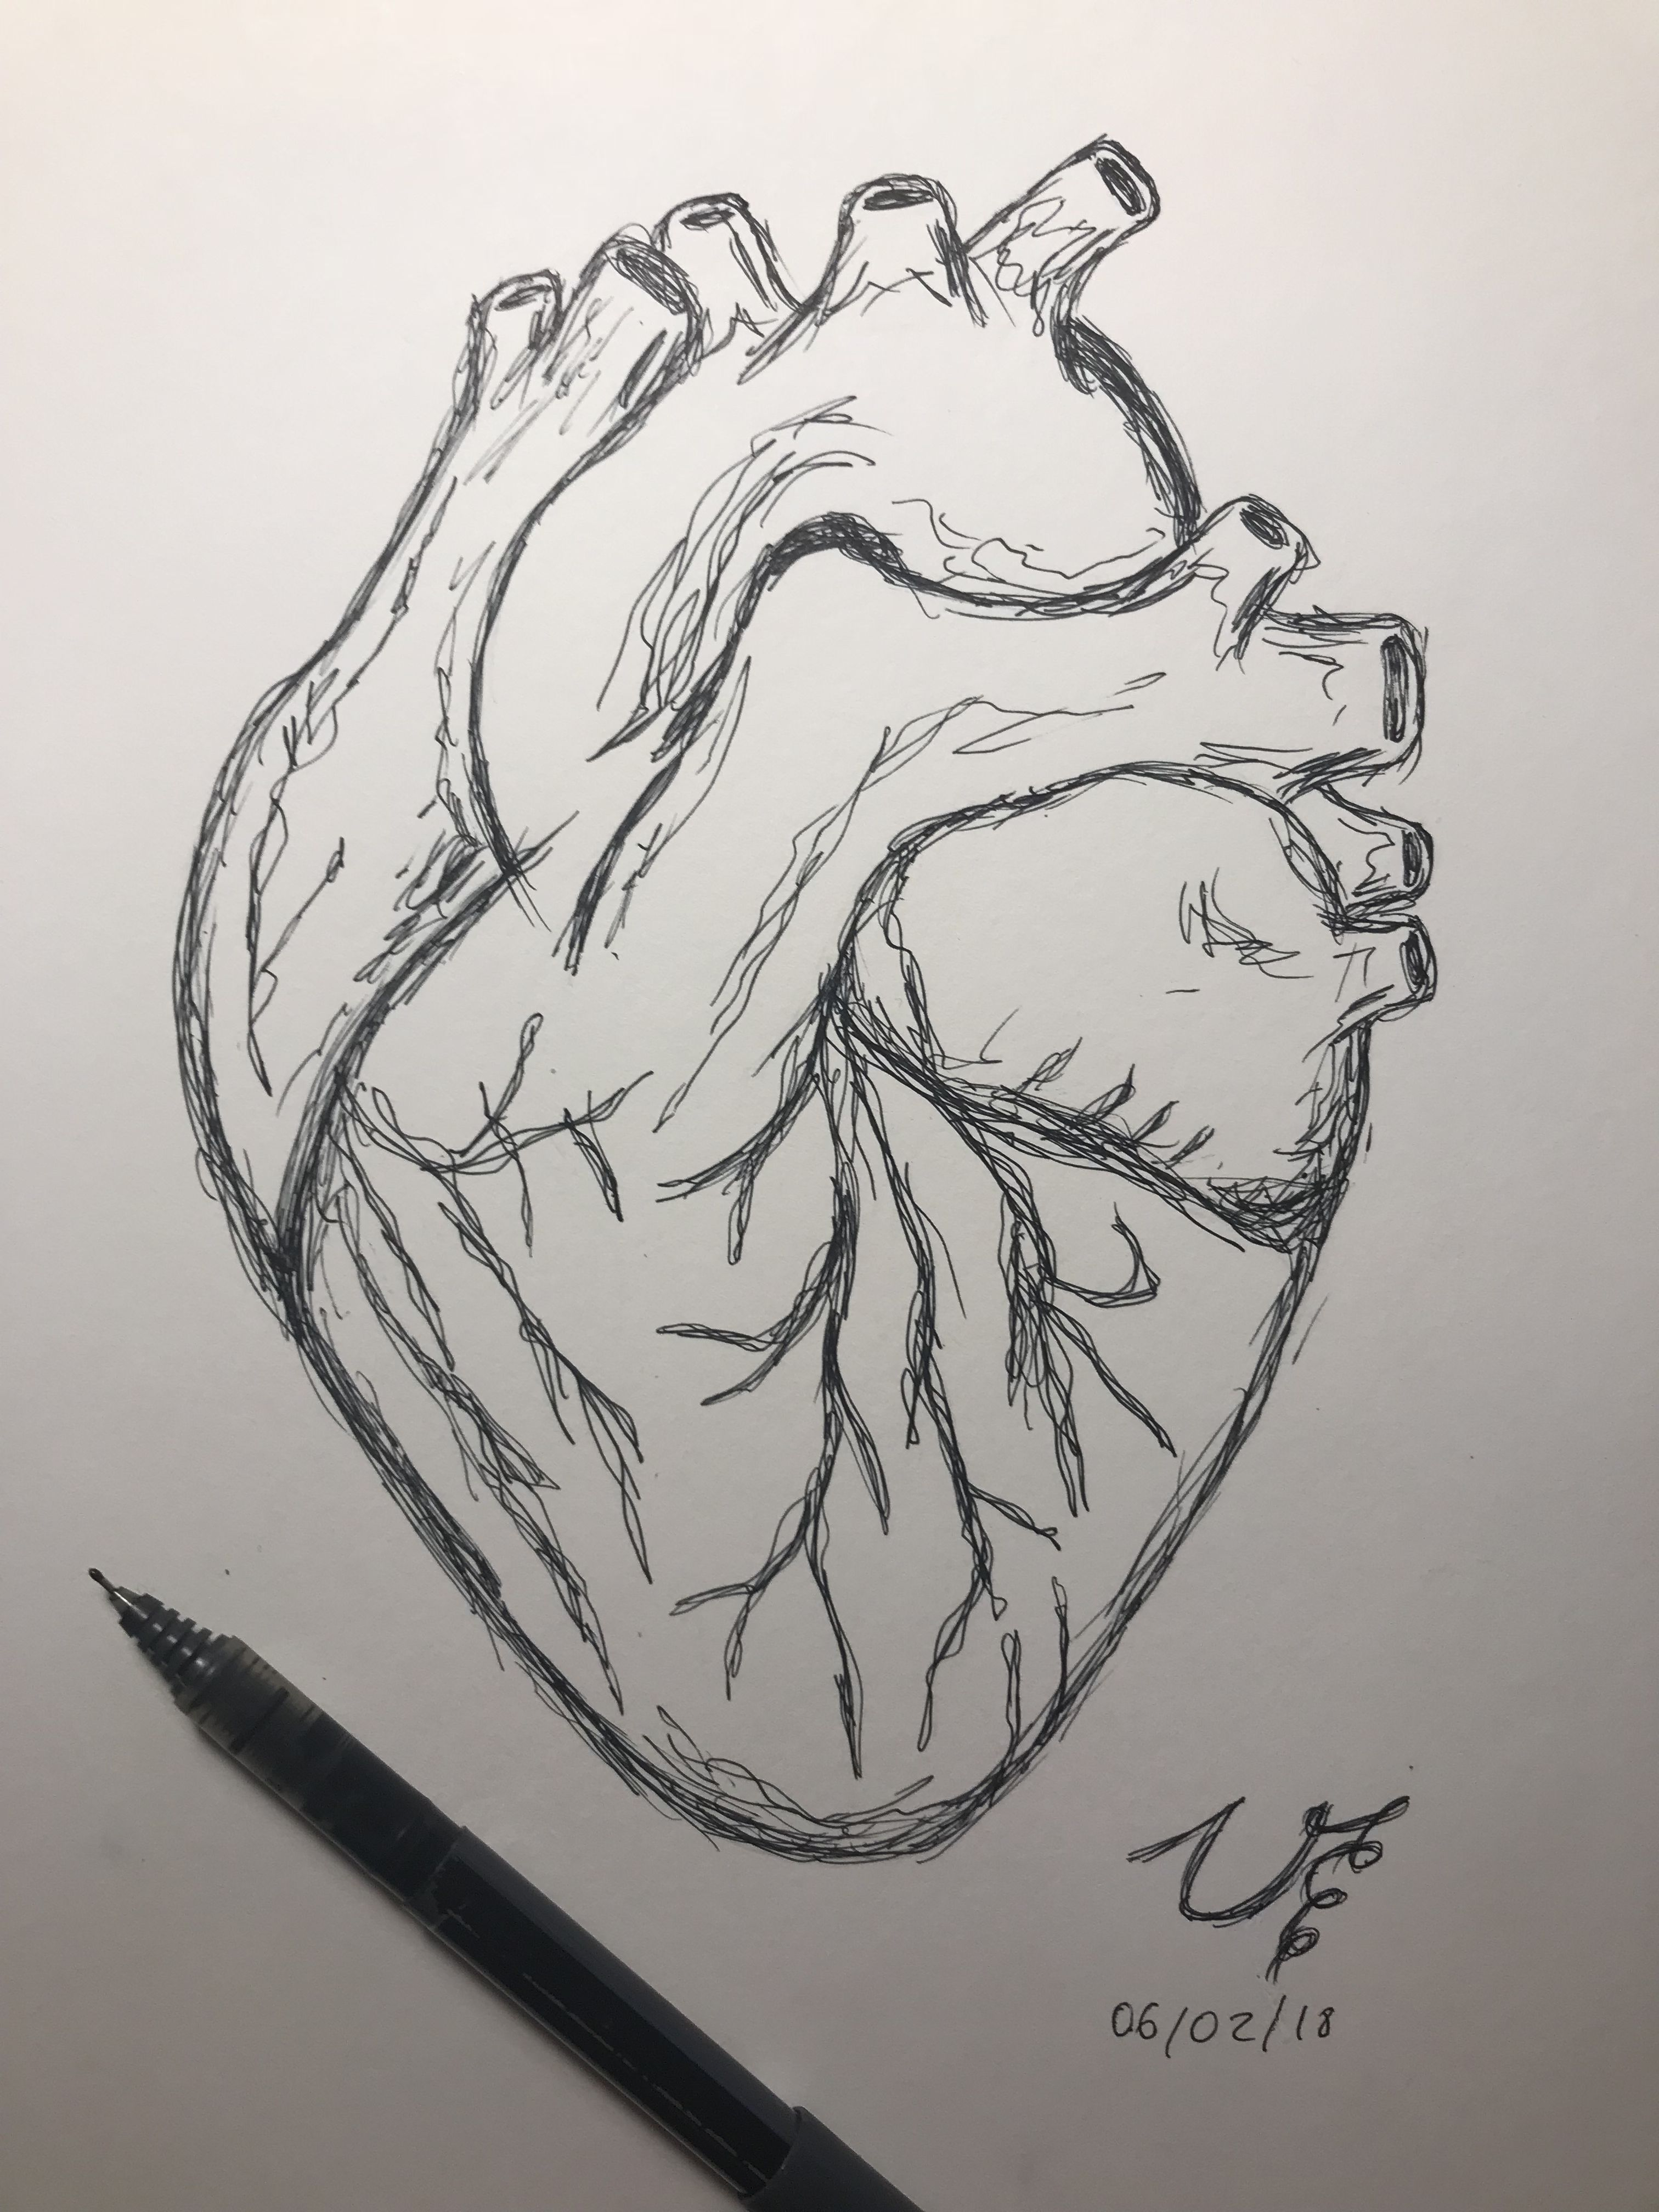 Pencil Sketch Of Human Heart